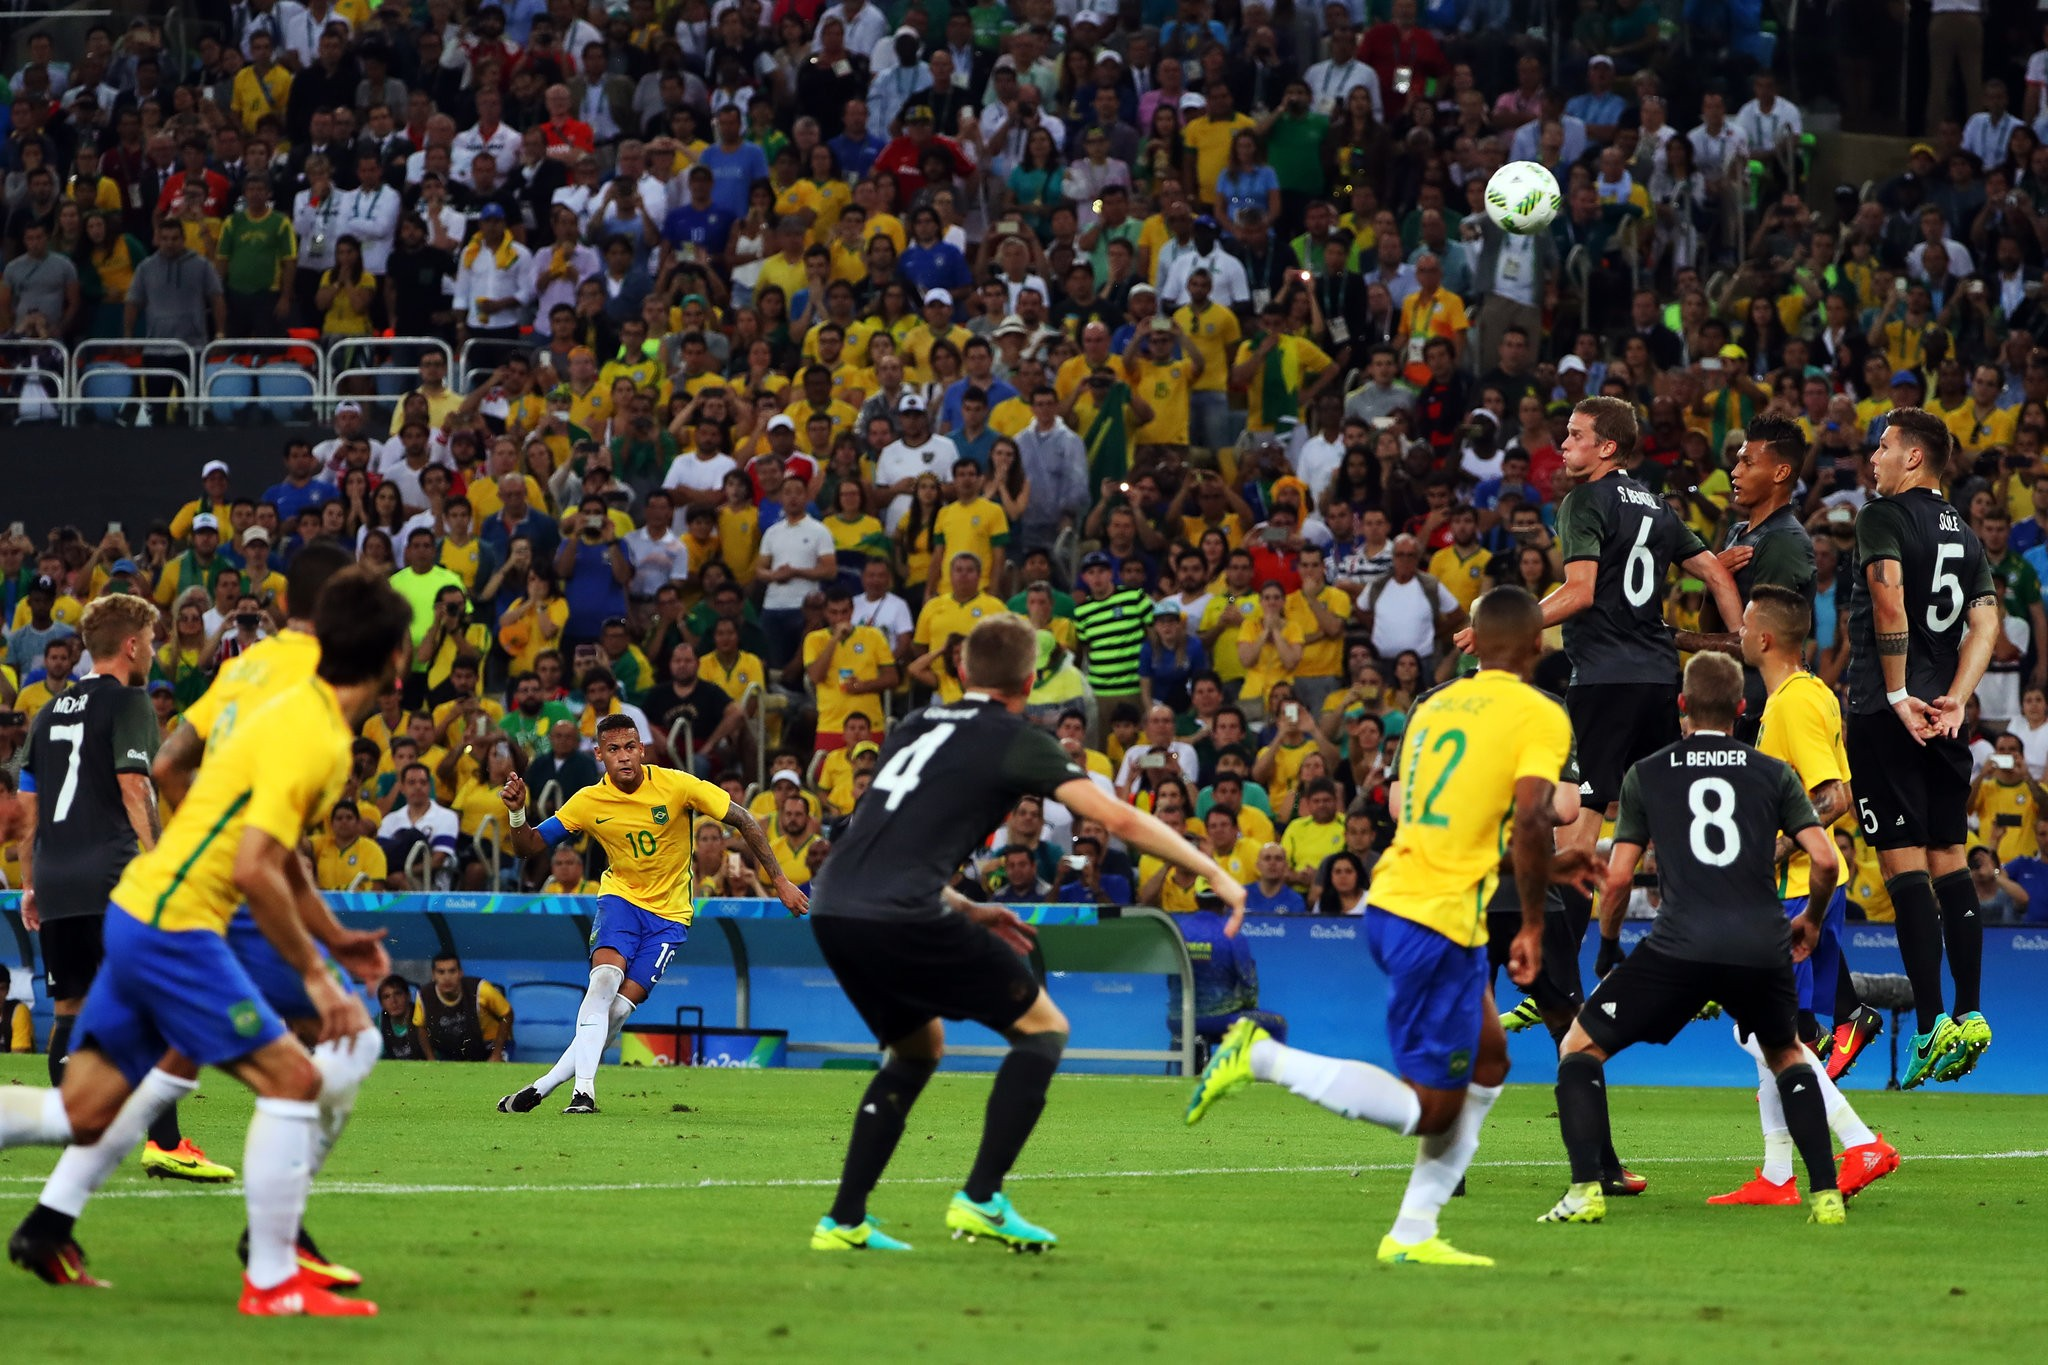 Олимпиада-2016. Финал. Бразилия – Германия – 1:1, пен. 5:4. Линекер наконец ошибся - изображение 2